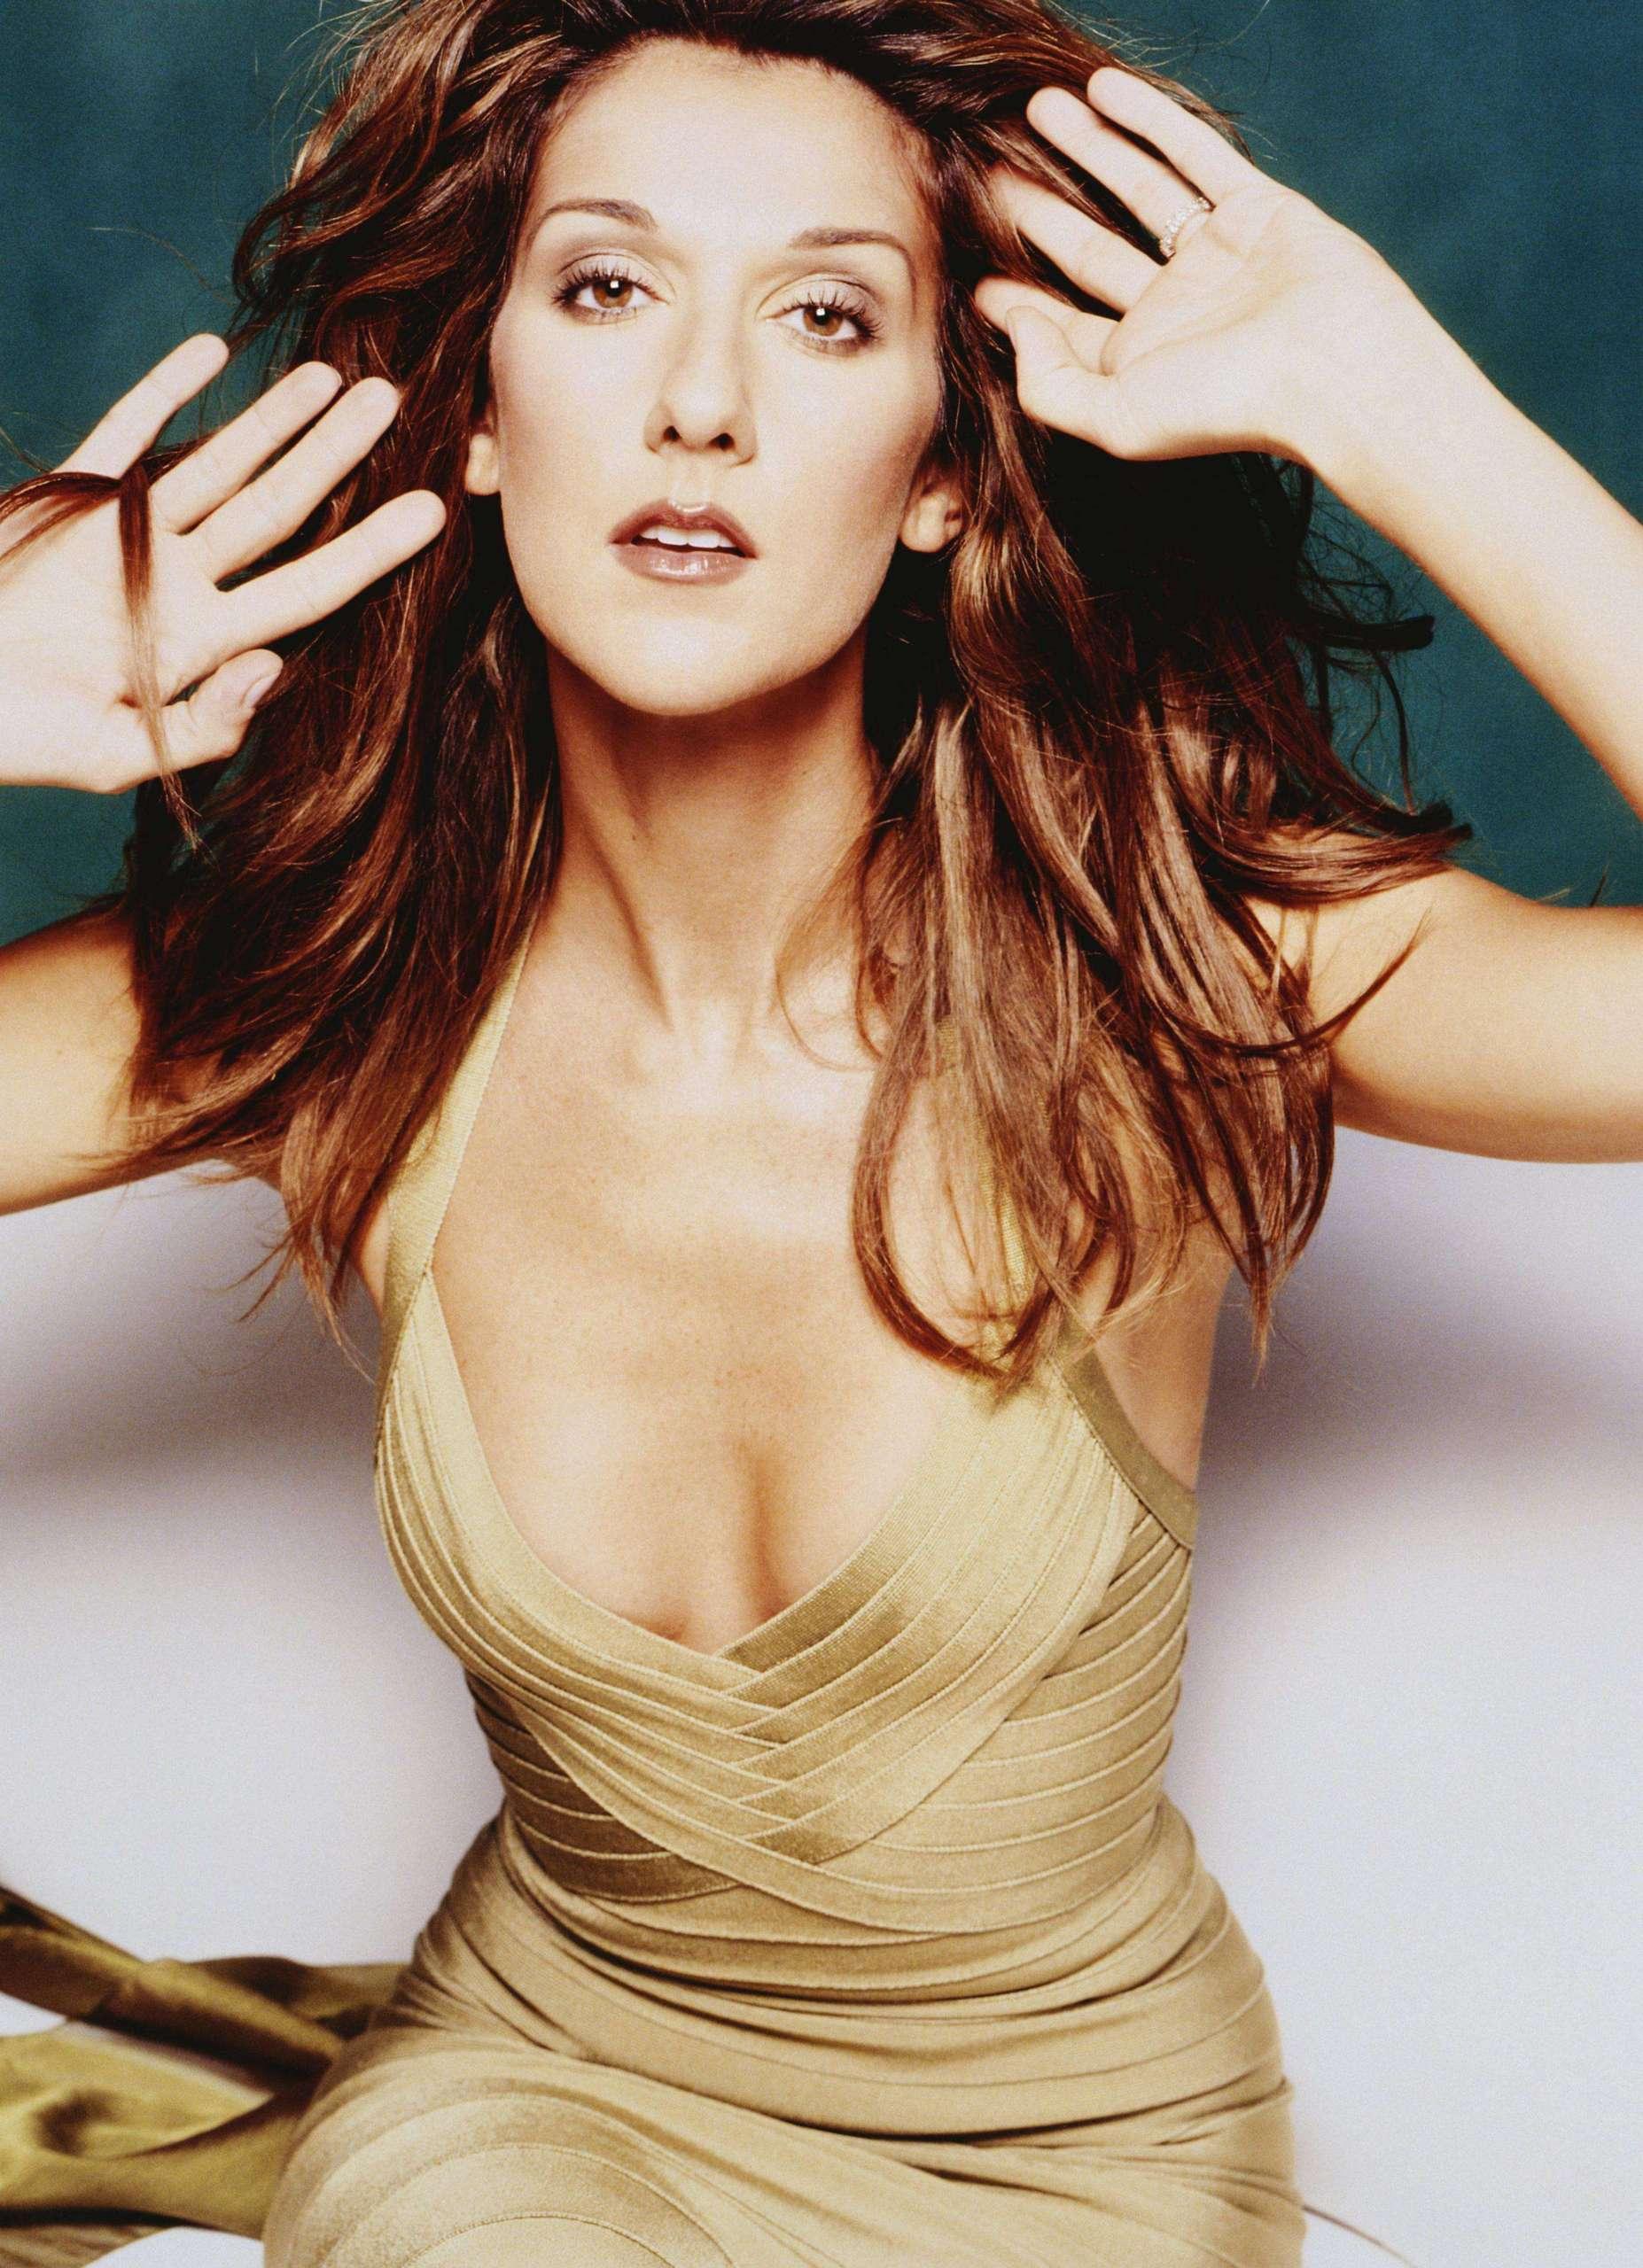 Celine Dion - Celine Dion Photo (131736) - Fanpop